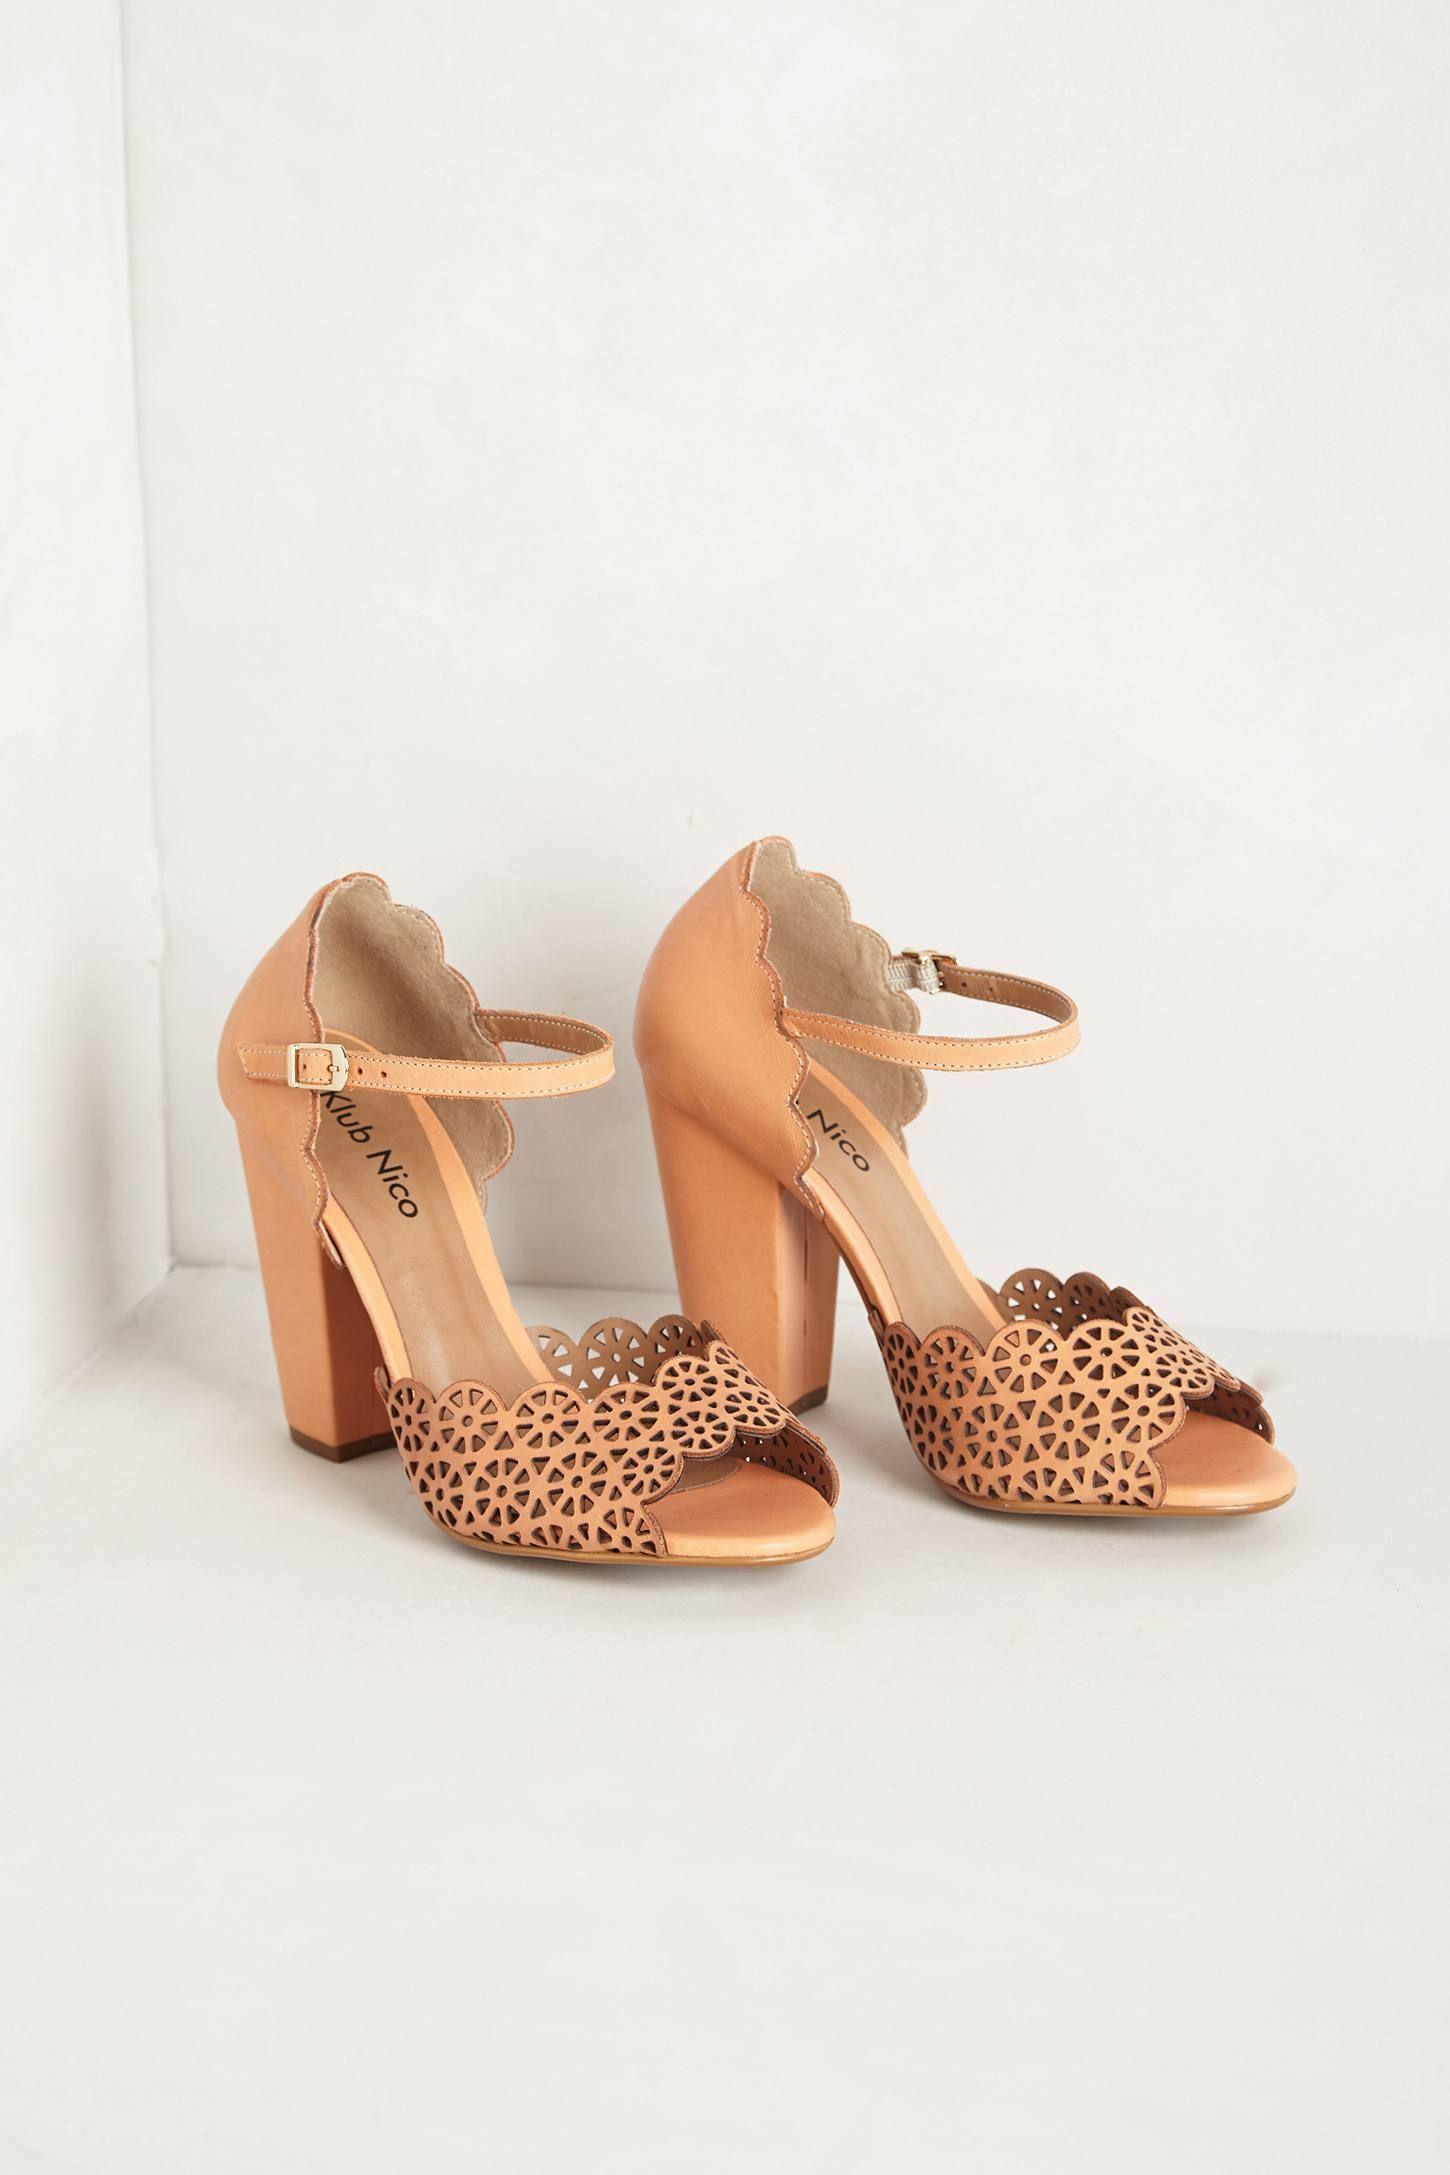 anthropologie klub nico shoes brazil 830111